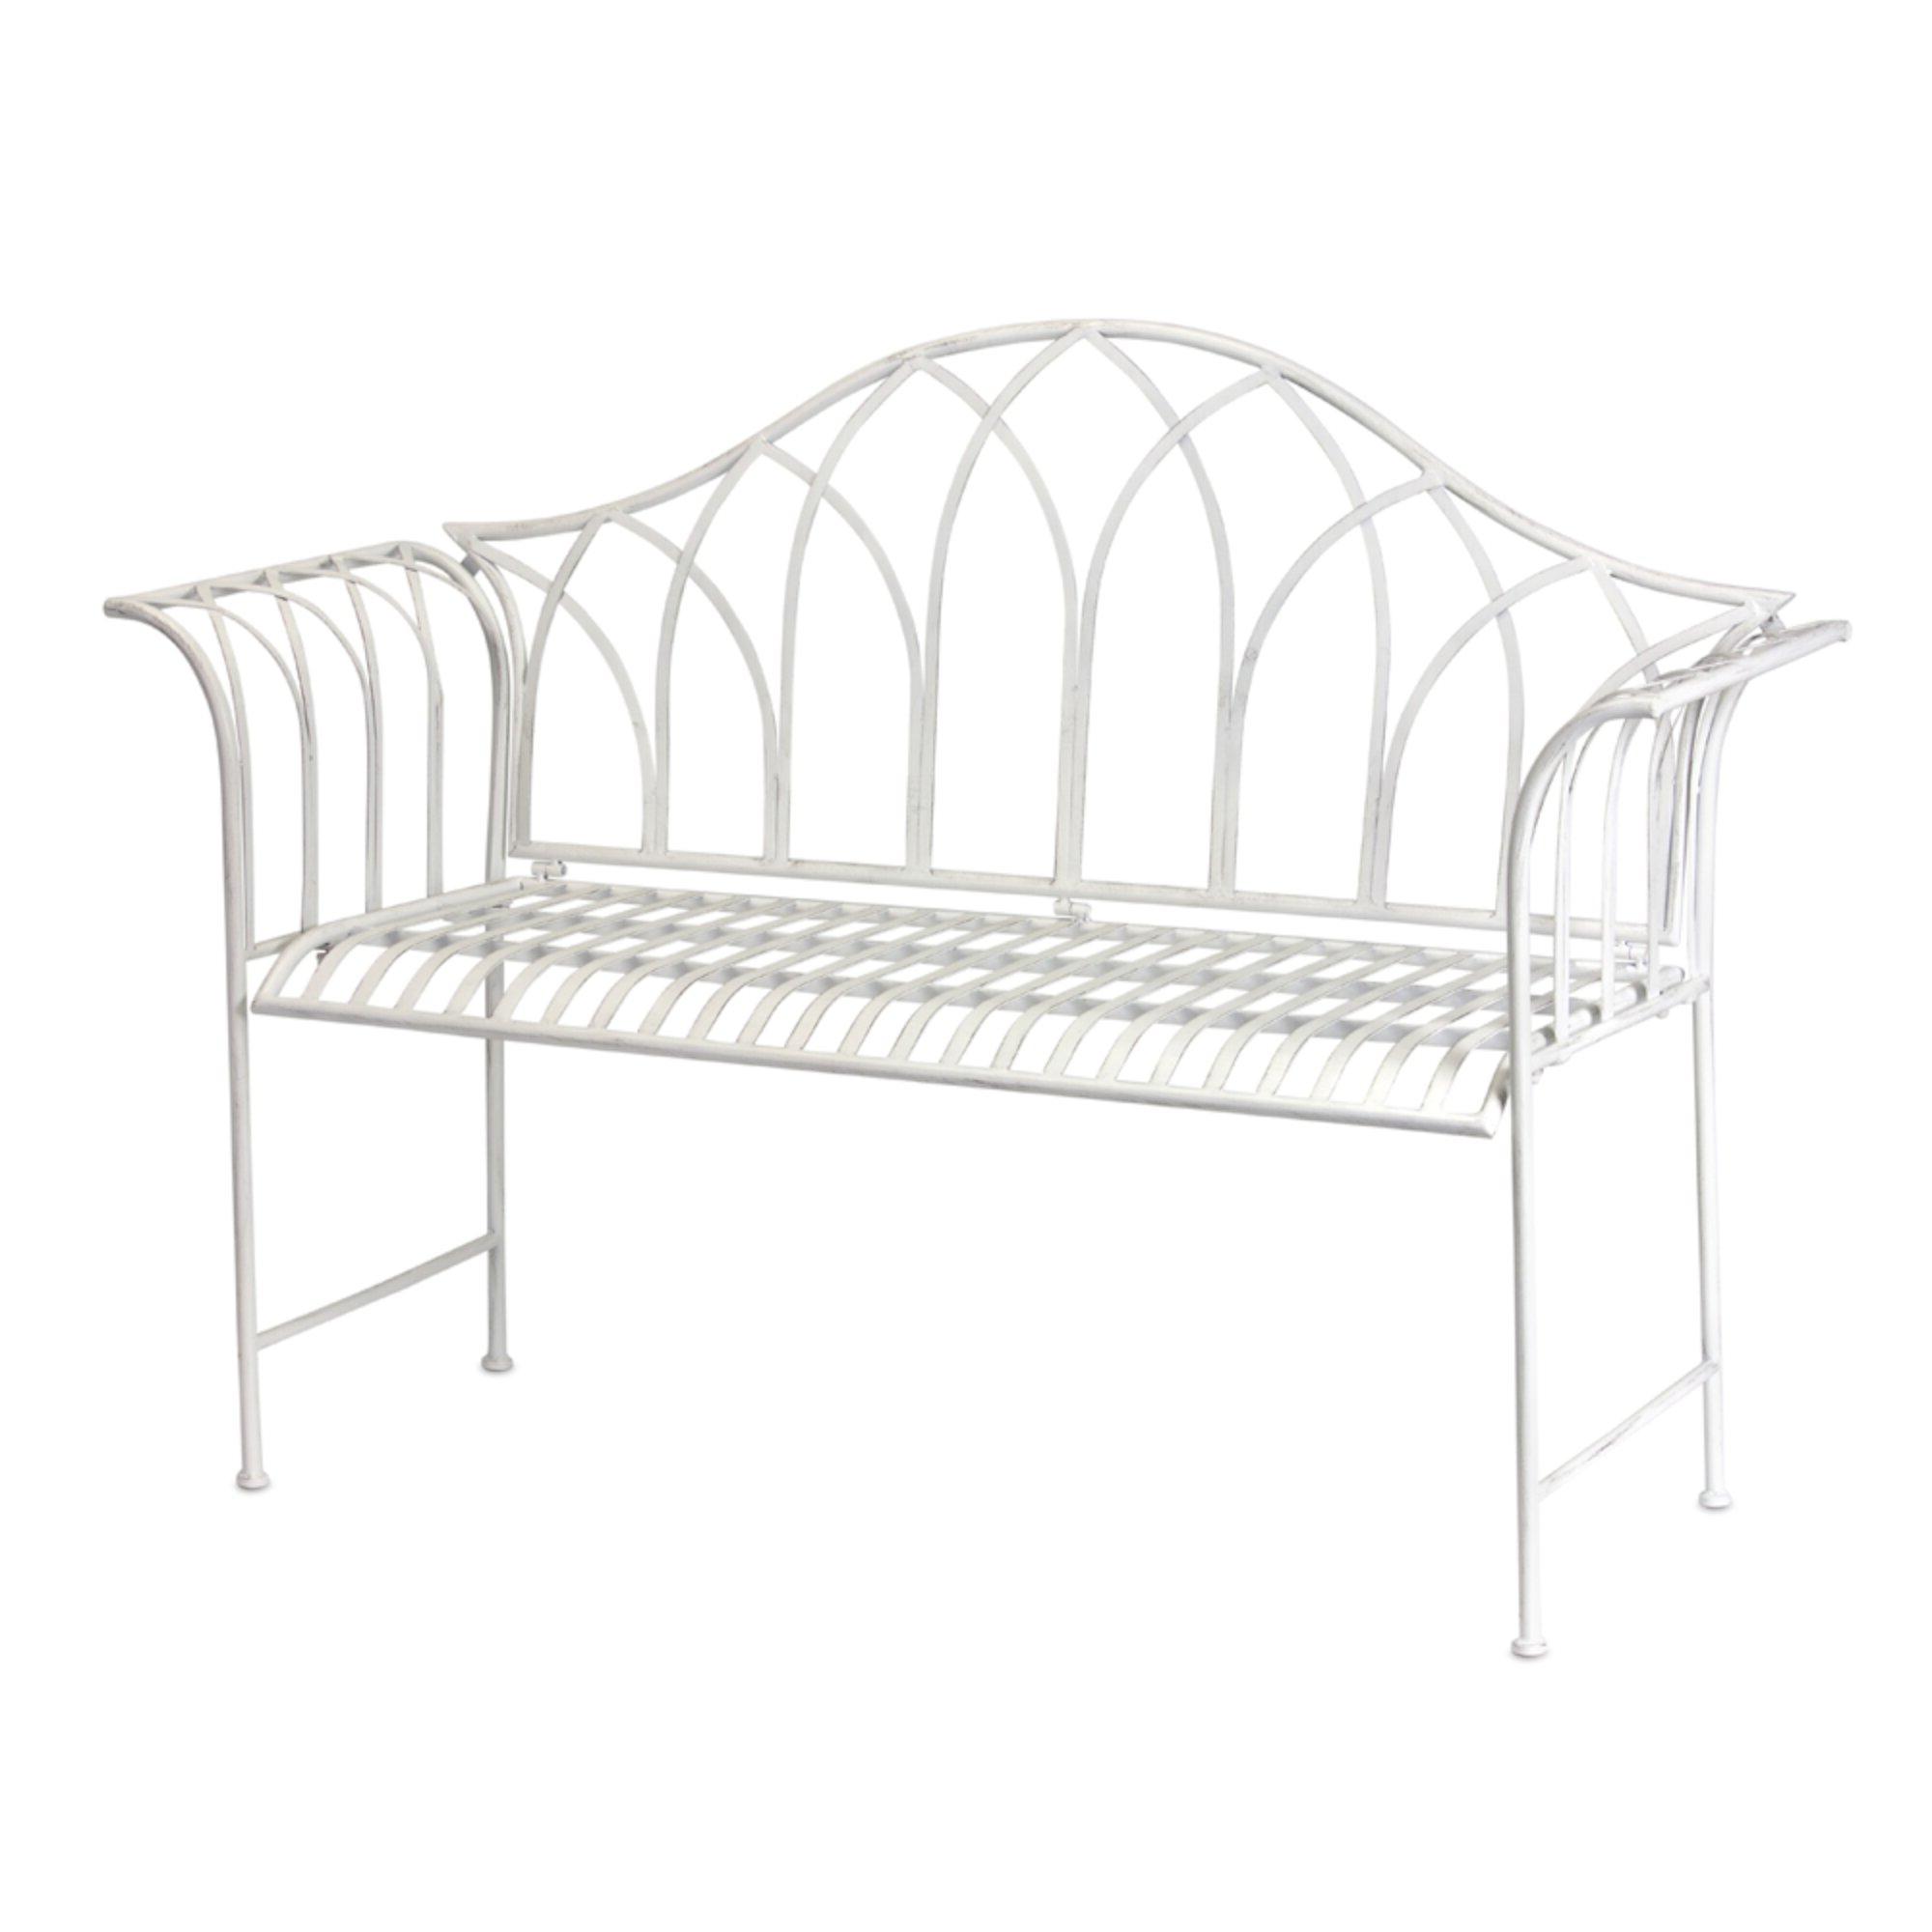 Preferred Haylia Iron Garden Bench With Gehlert Traditional Patio Iron Garden Benches (View 7 of 30)